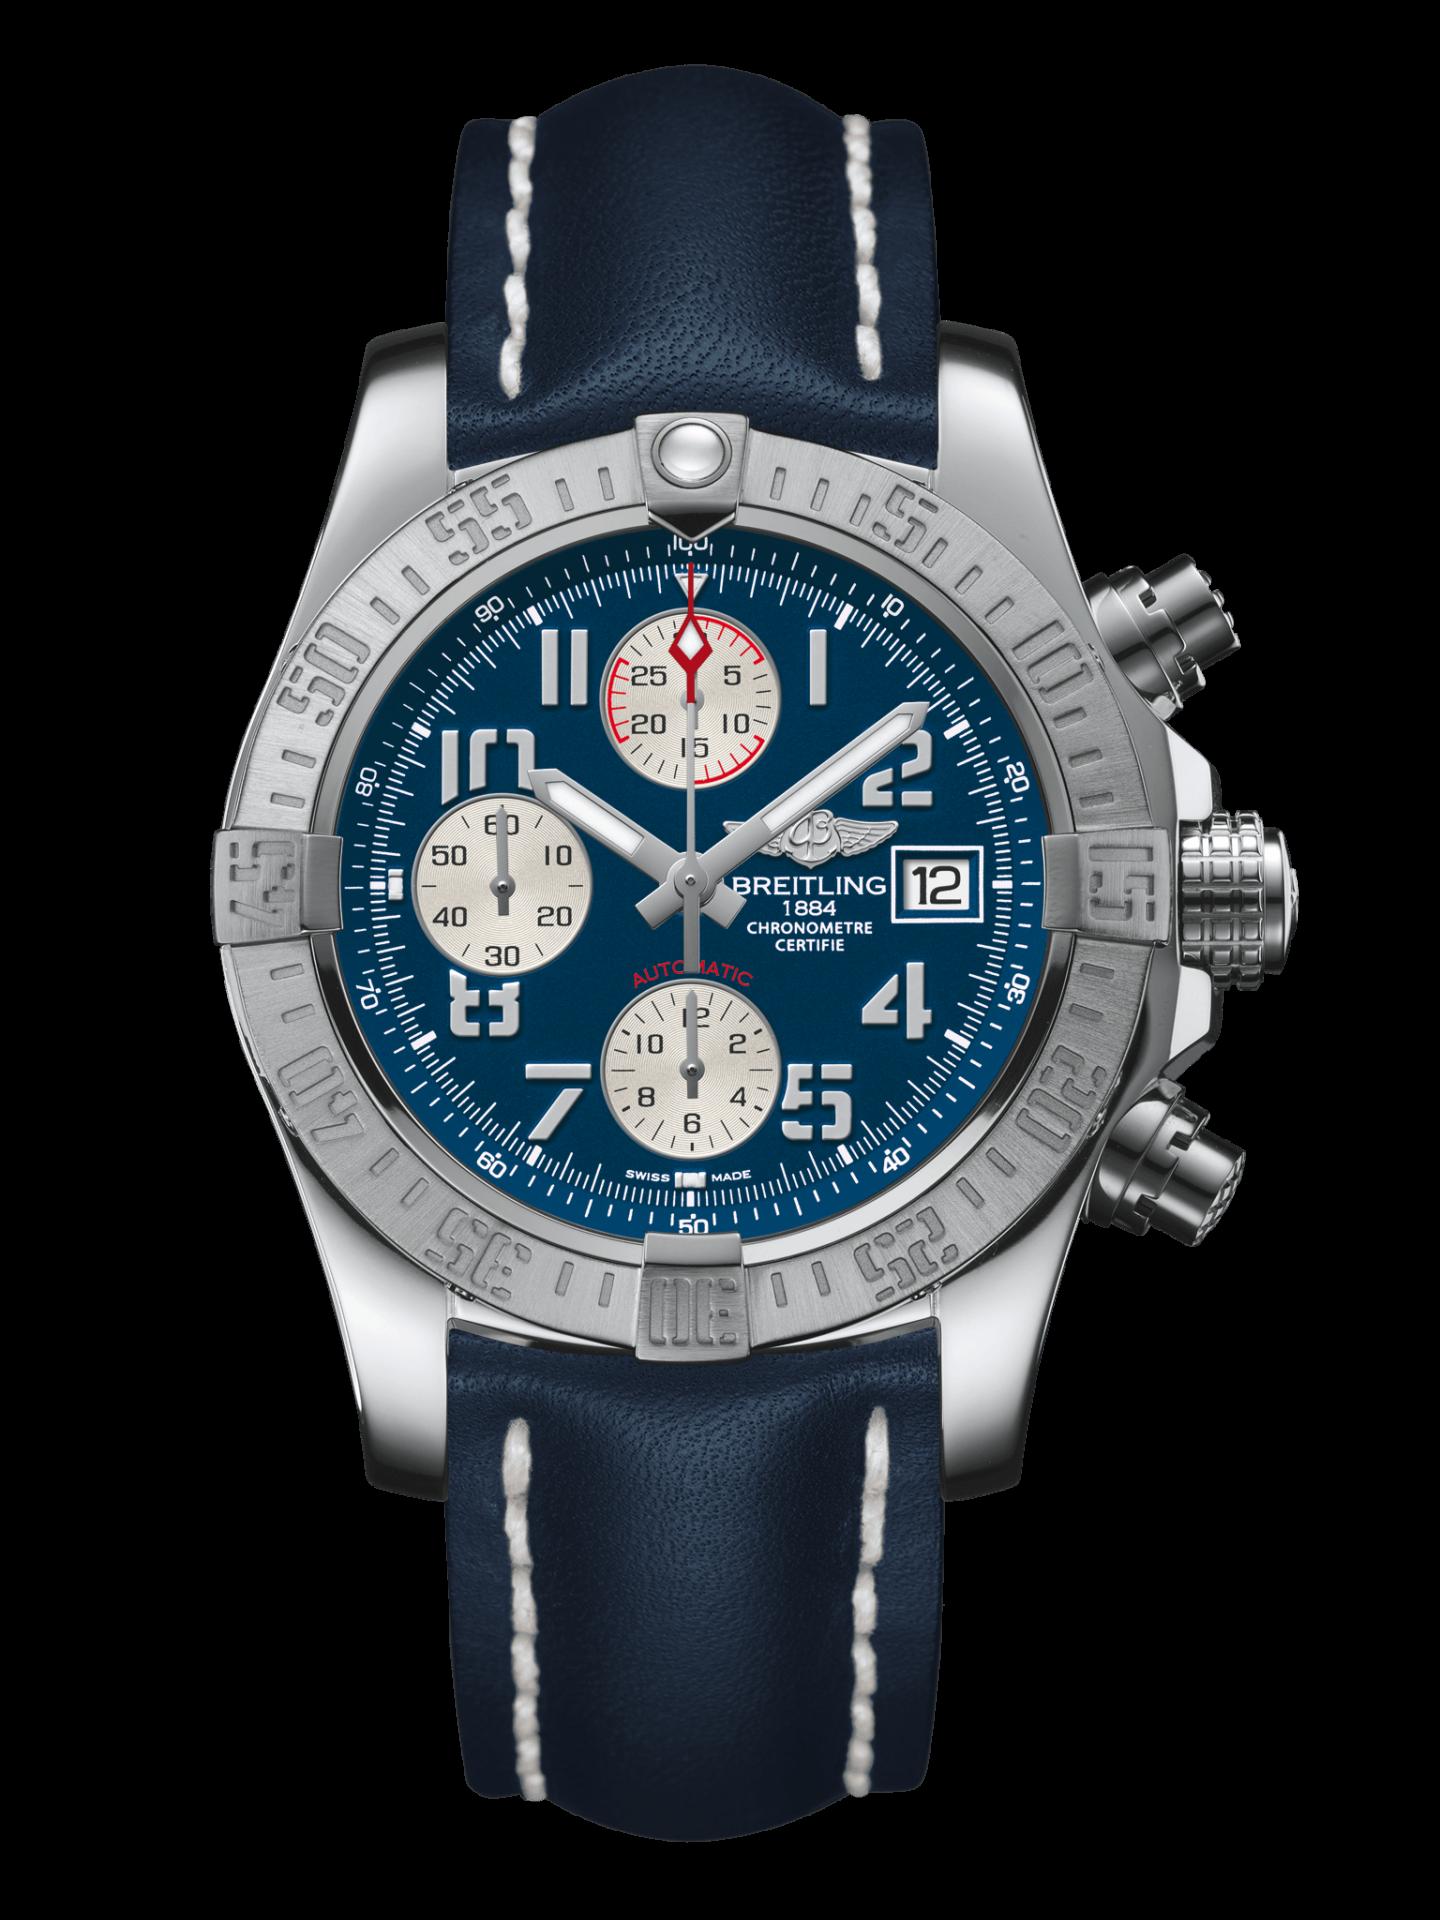 Breitling-Avenger-Avenger-II-Hall-of-Time-A1338111-C870-105X-A20BA.1